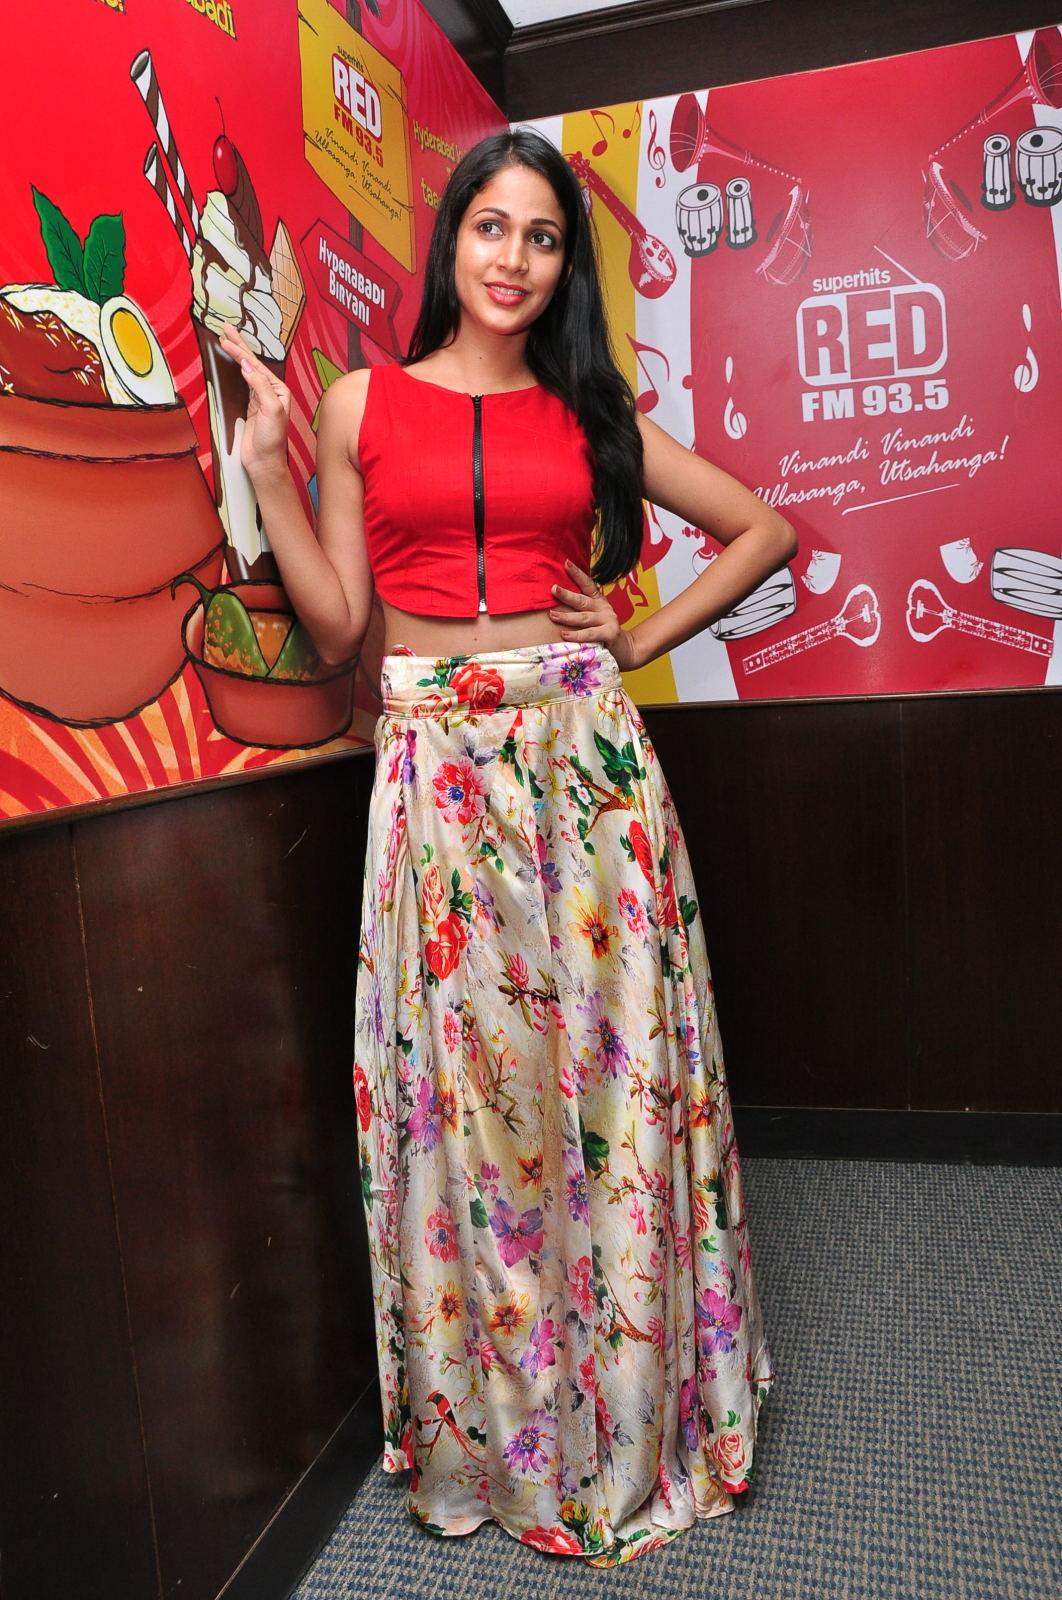 Lavanya at Red Fm Radio station-HQ-Photo-2